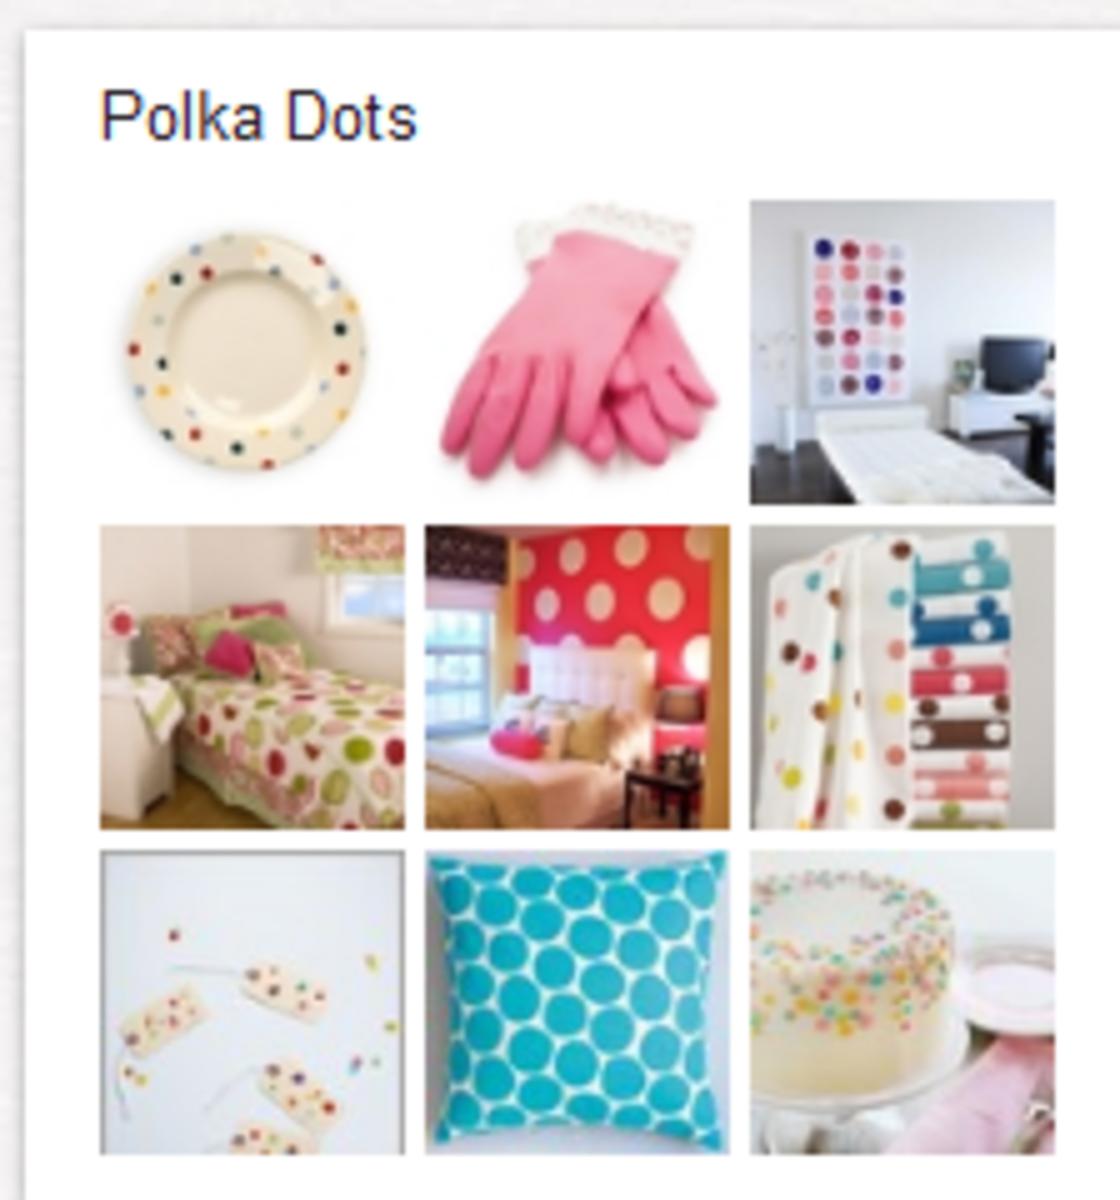 Polka Dots Board